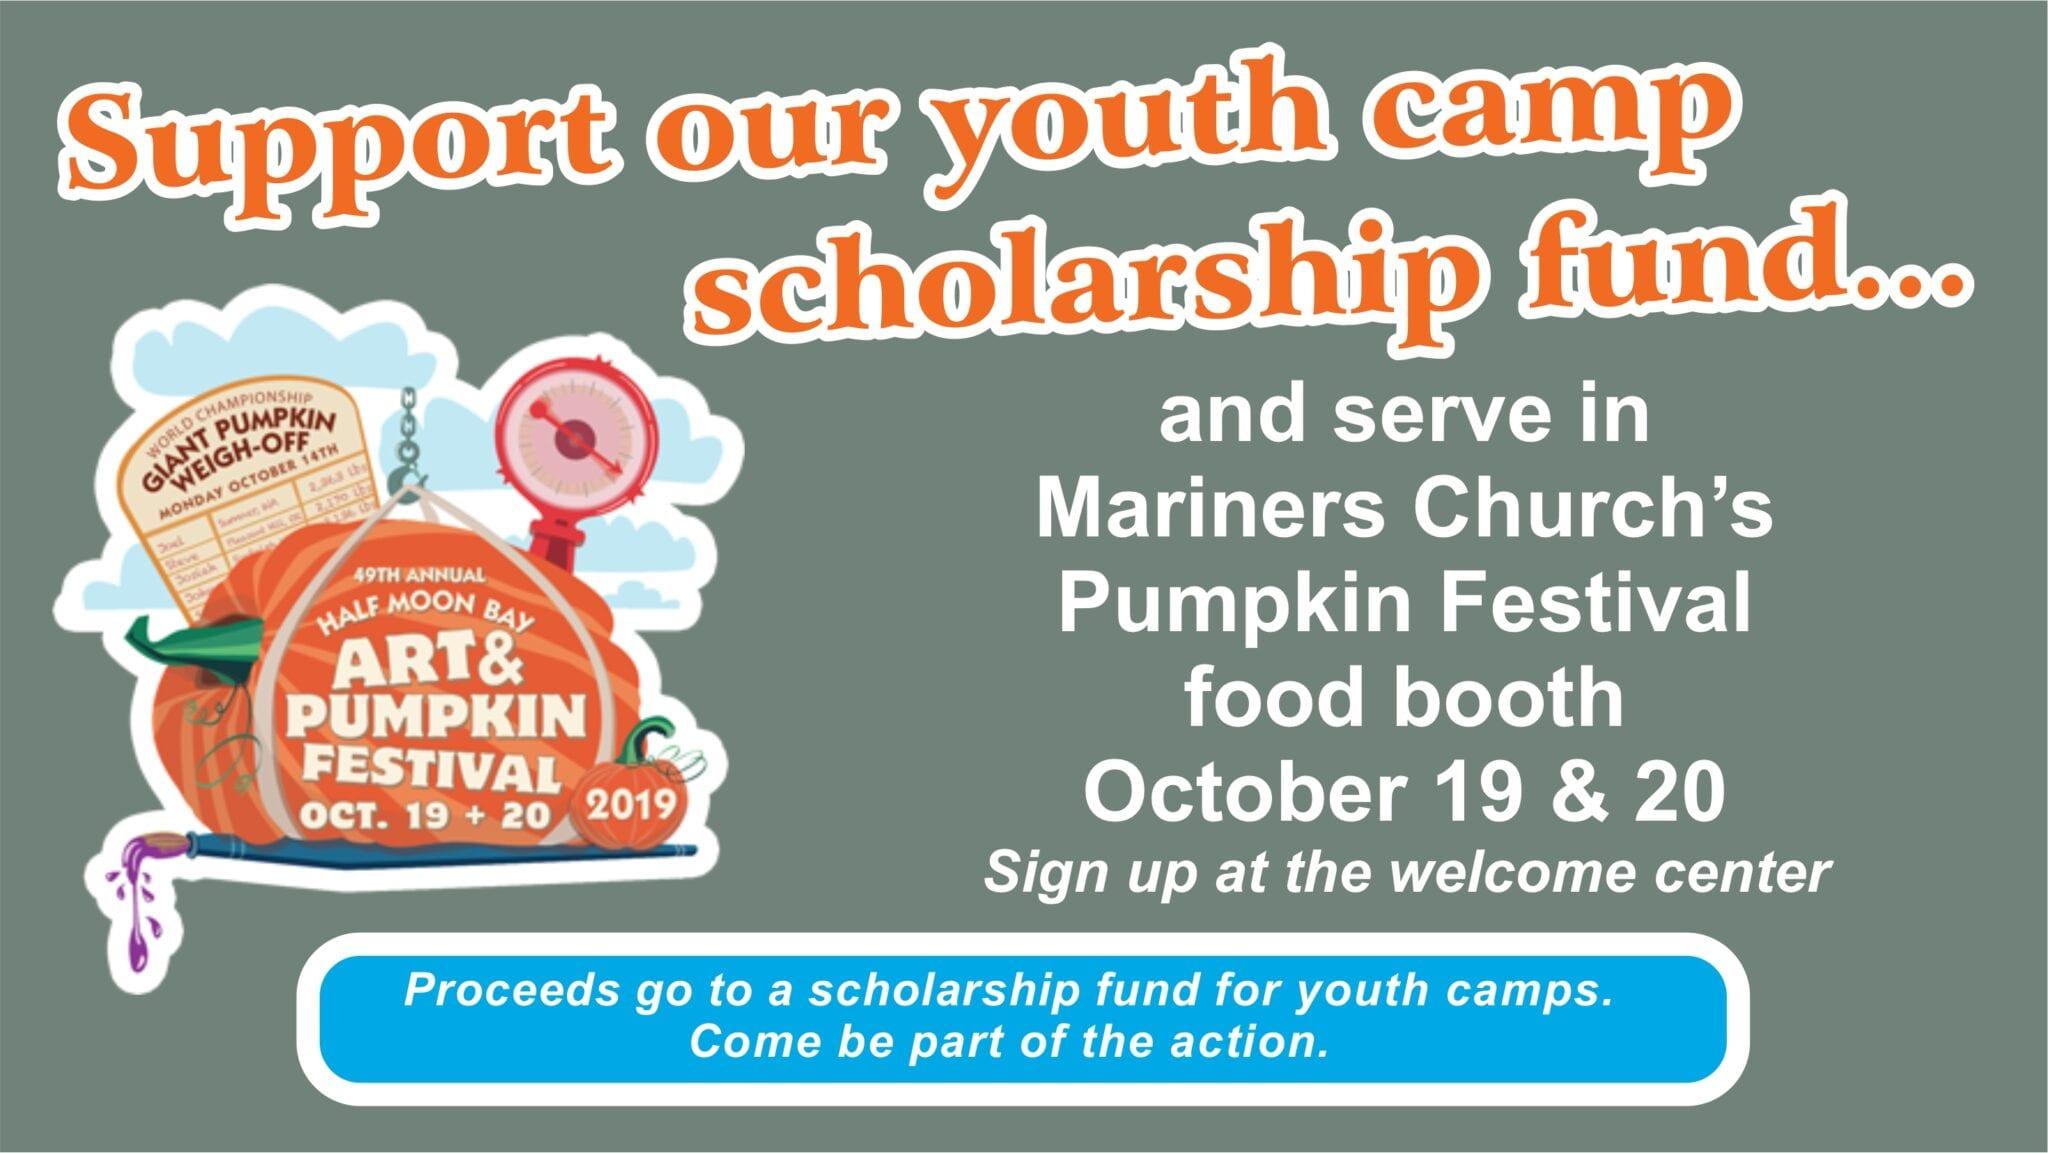 Pumpkin Festival Food Booth